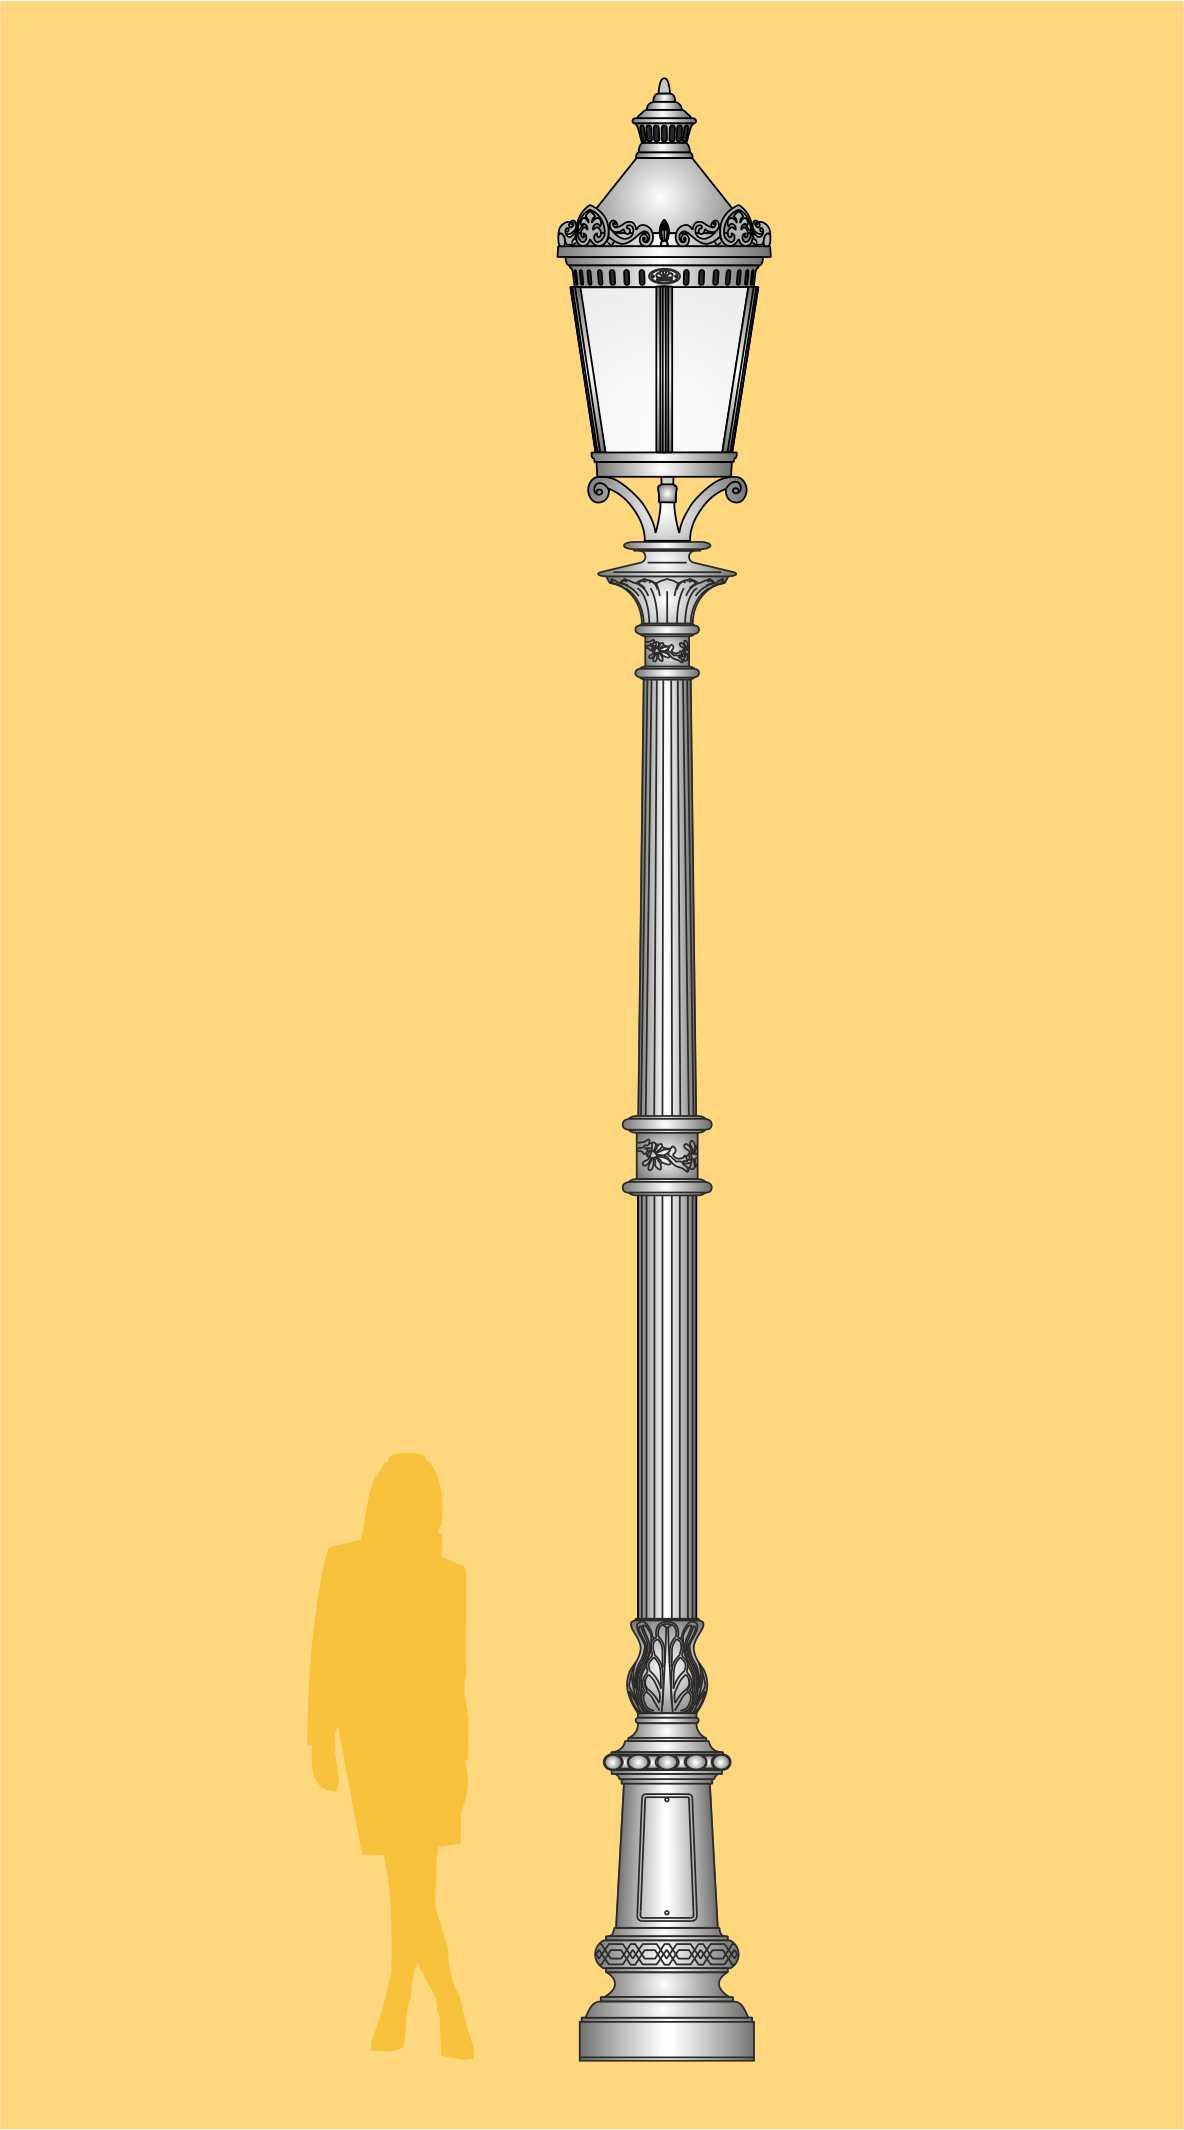 stylowa latarnia, ekskluzywna latarnia LED, latarnia ogrodowa